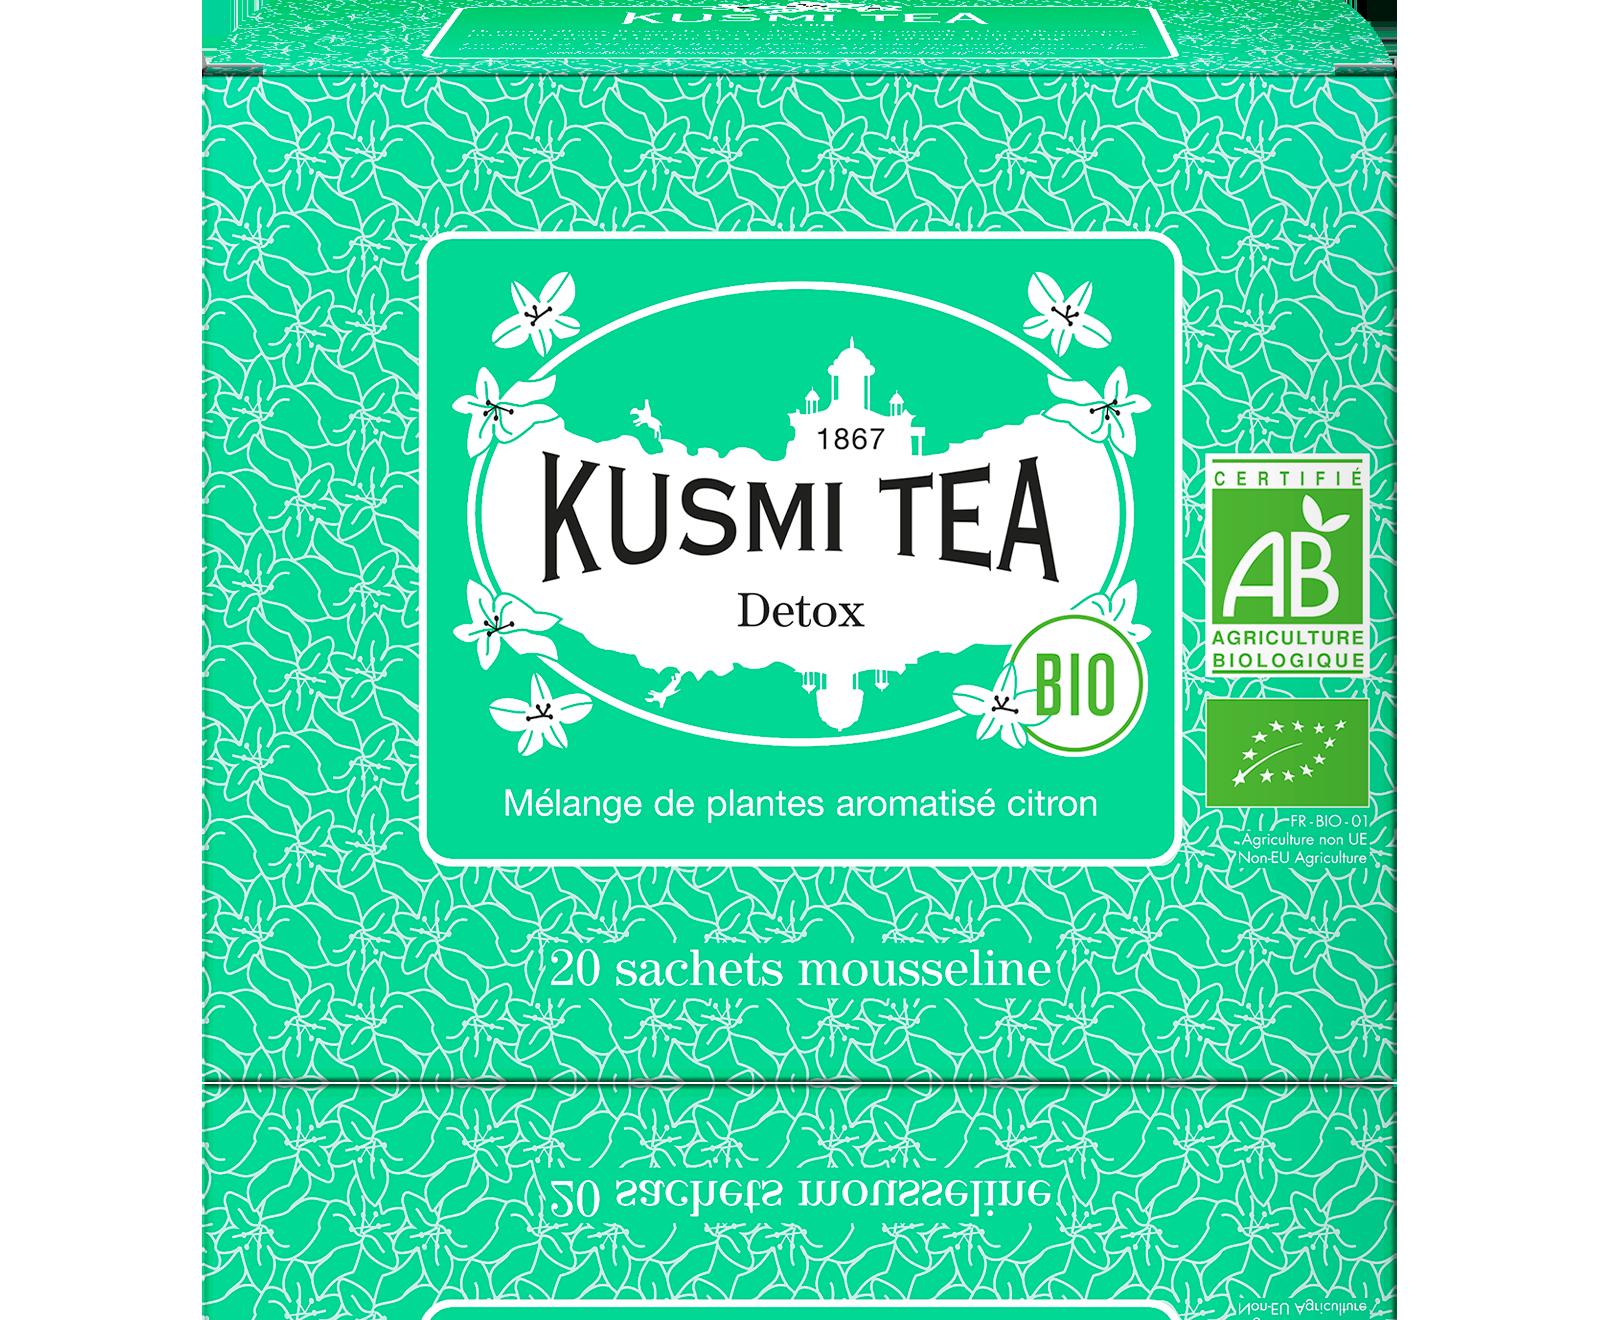 Thé vert, maté - Detox bio - Sachets de thé - Kusmi Tea